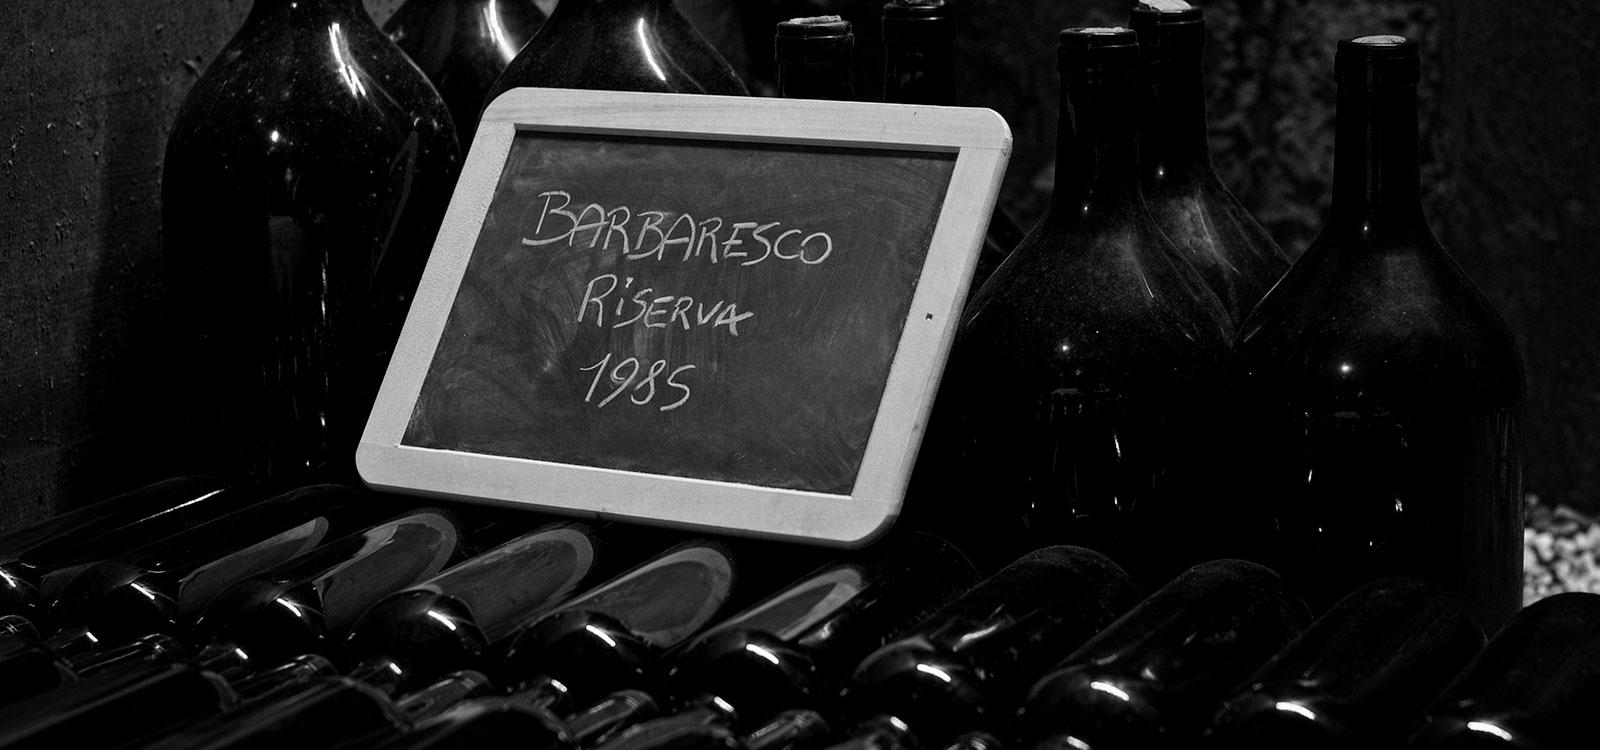 Barbaresco Pajè Riserva